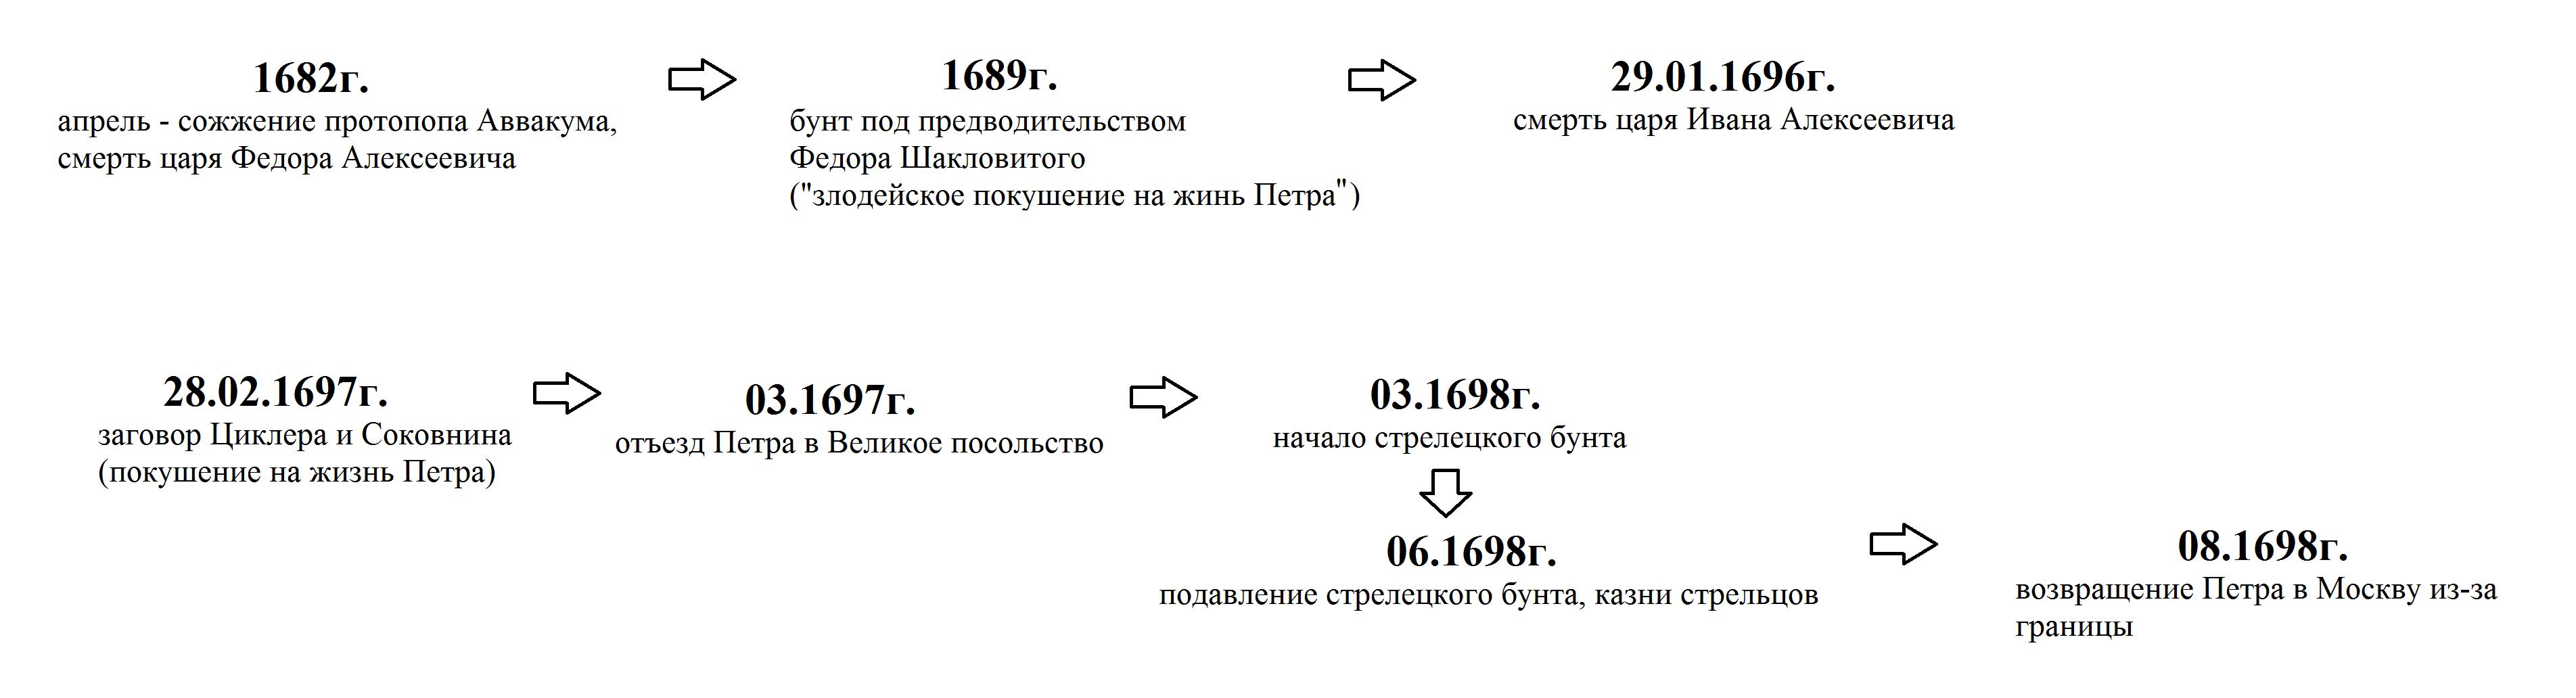 Бунт стрелецкий 1682 года таблица